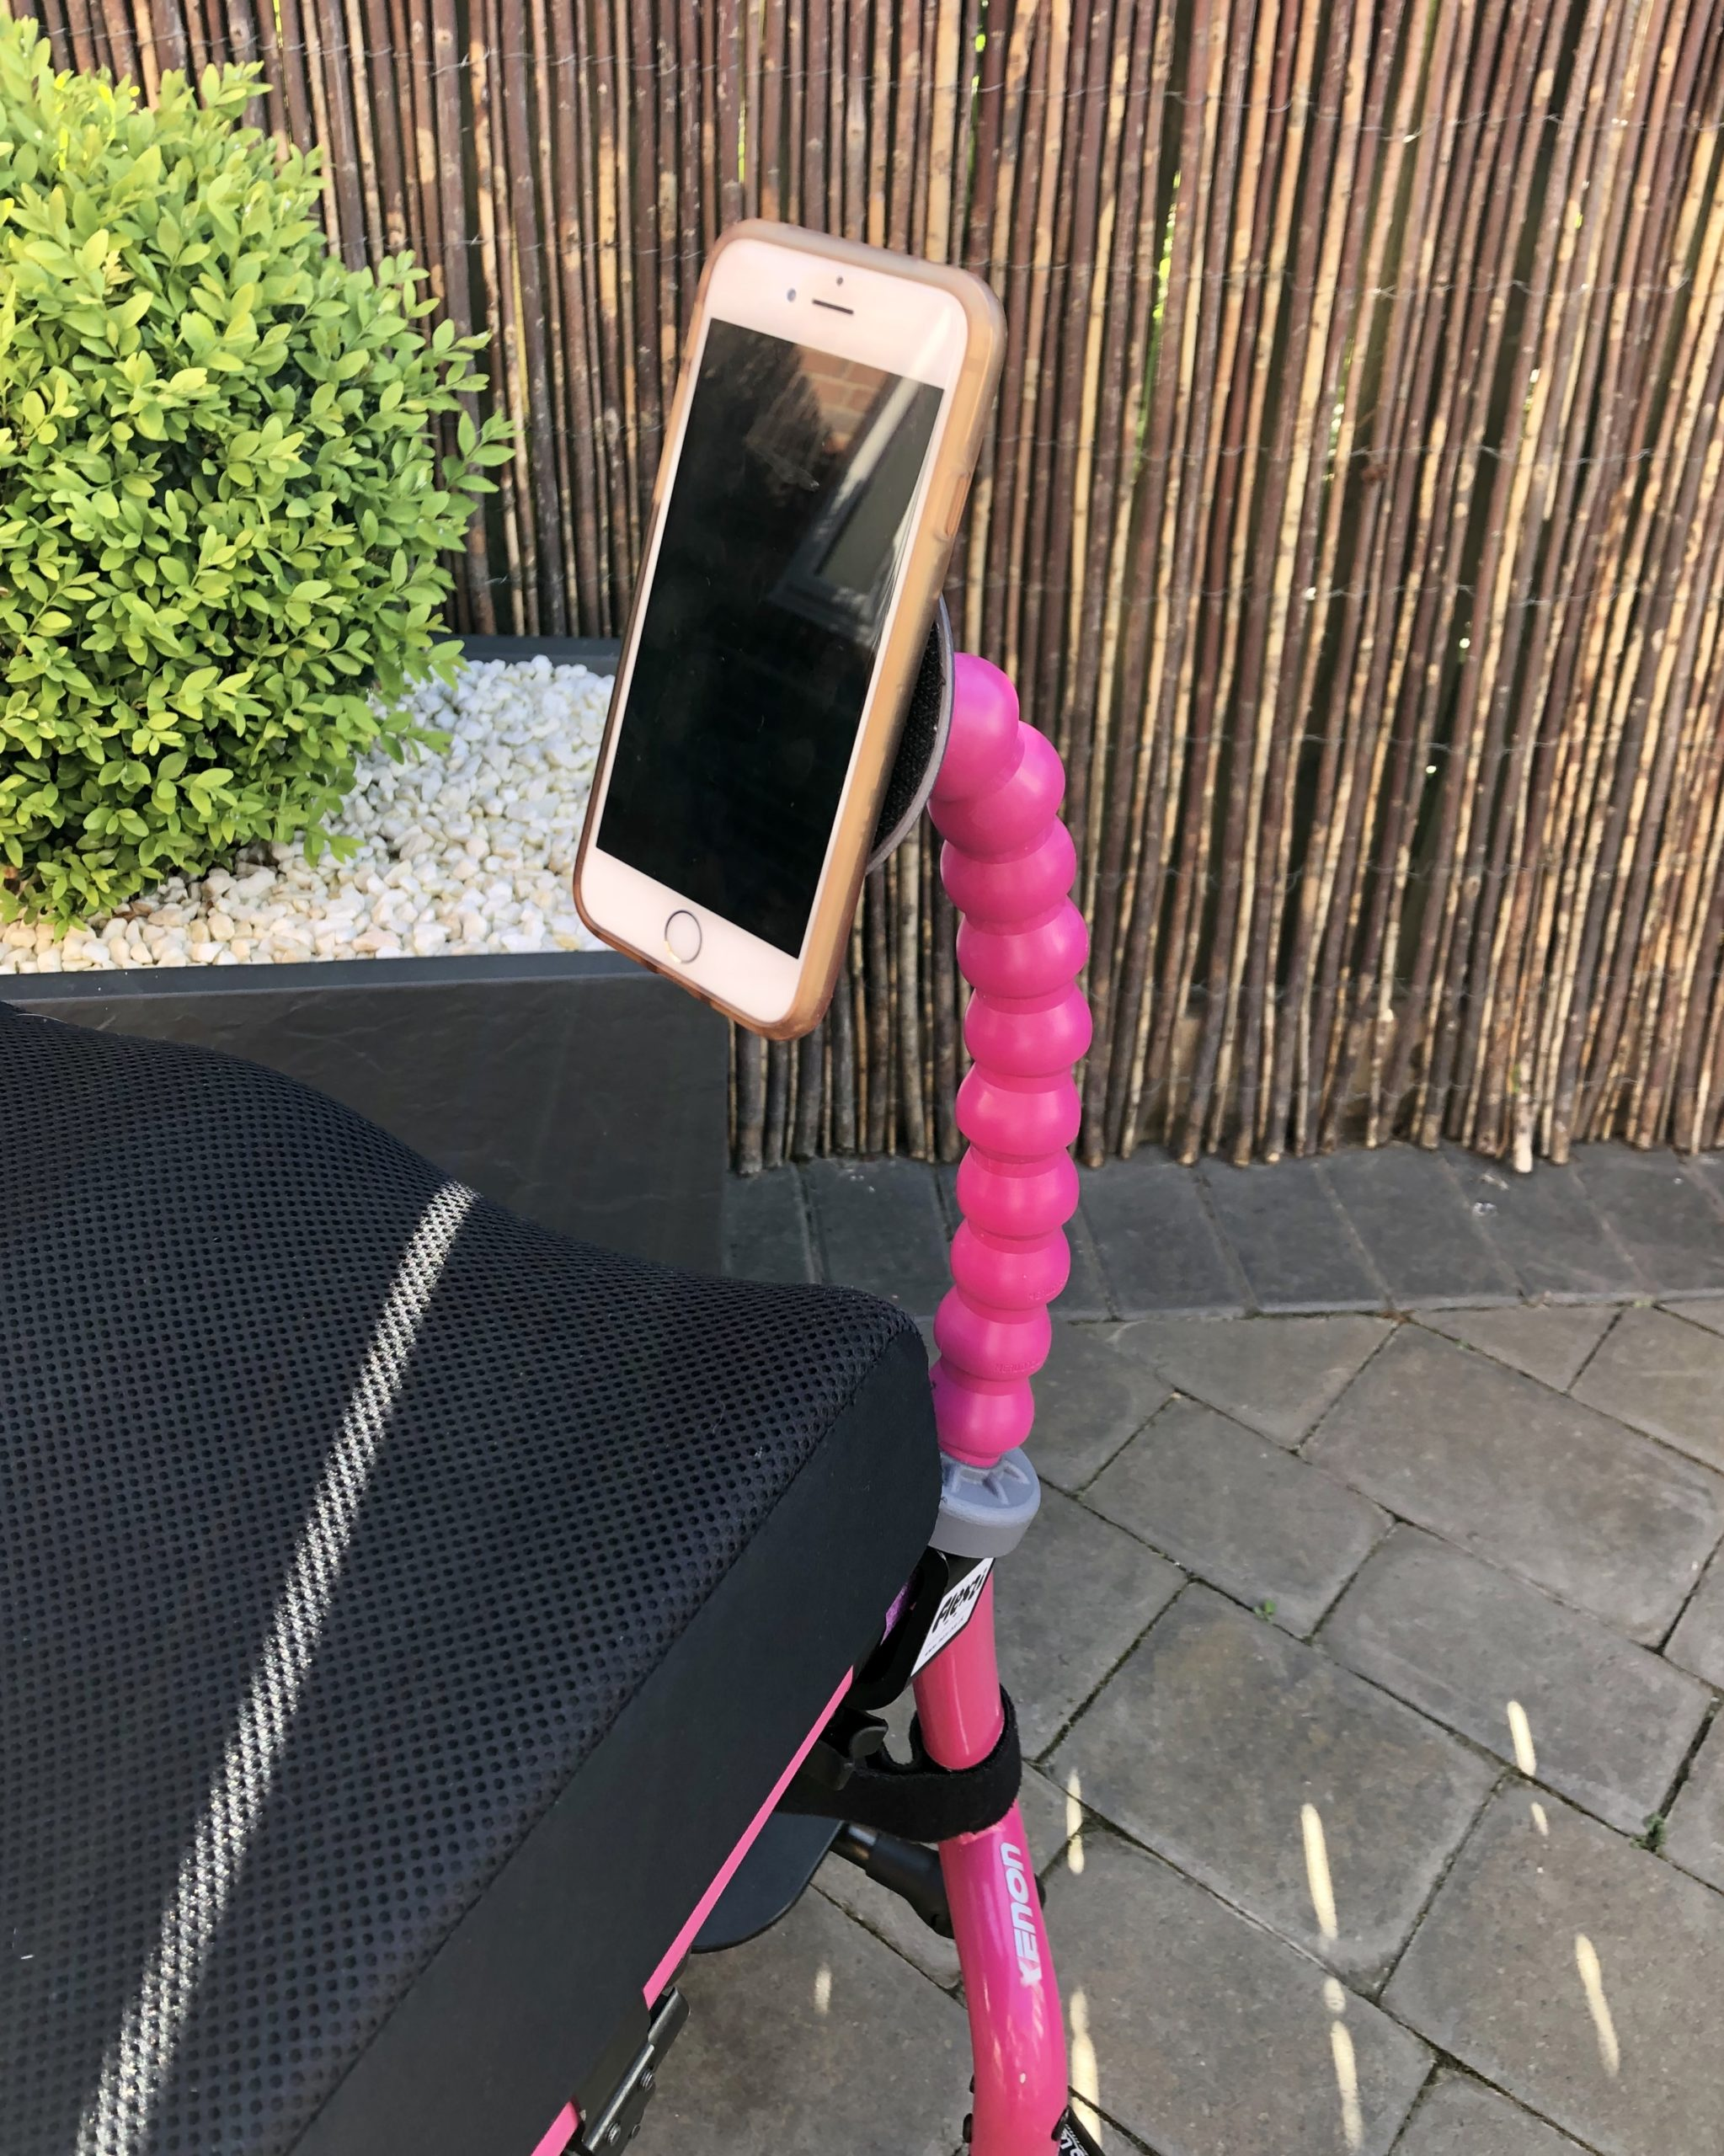 Flexzi 1 – Gadget Stand